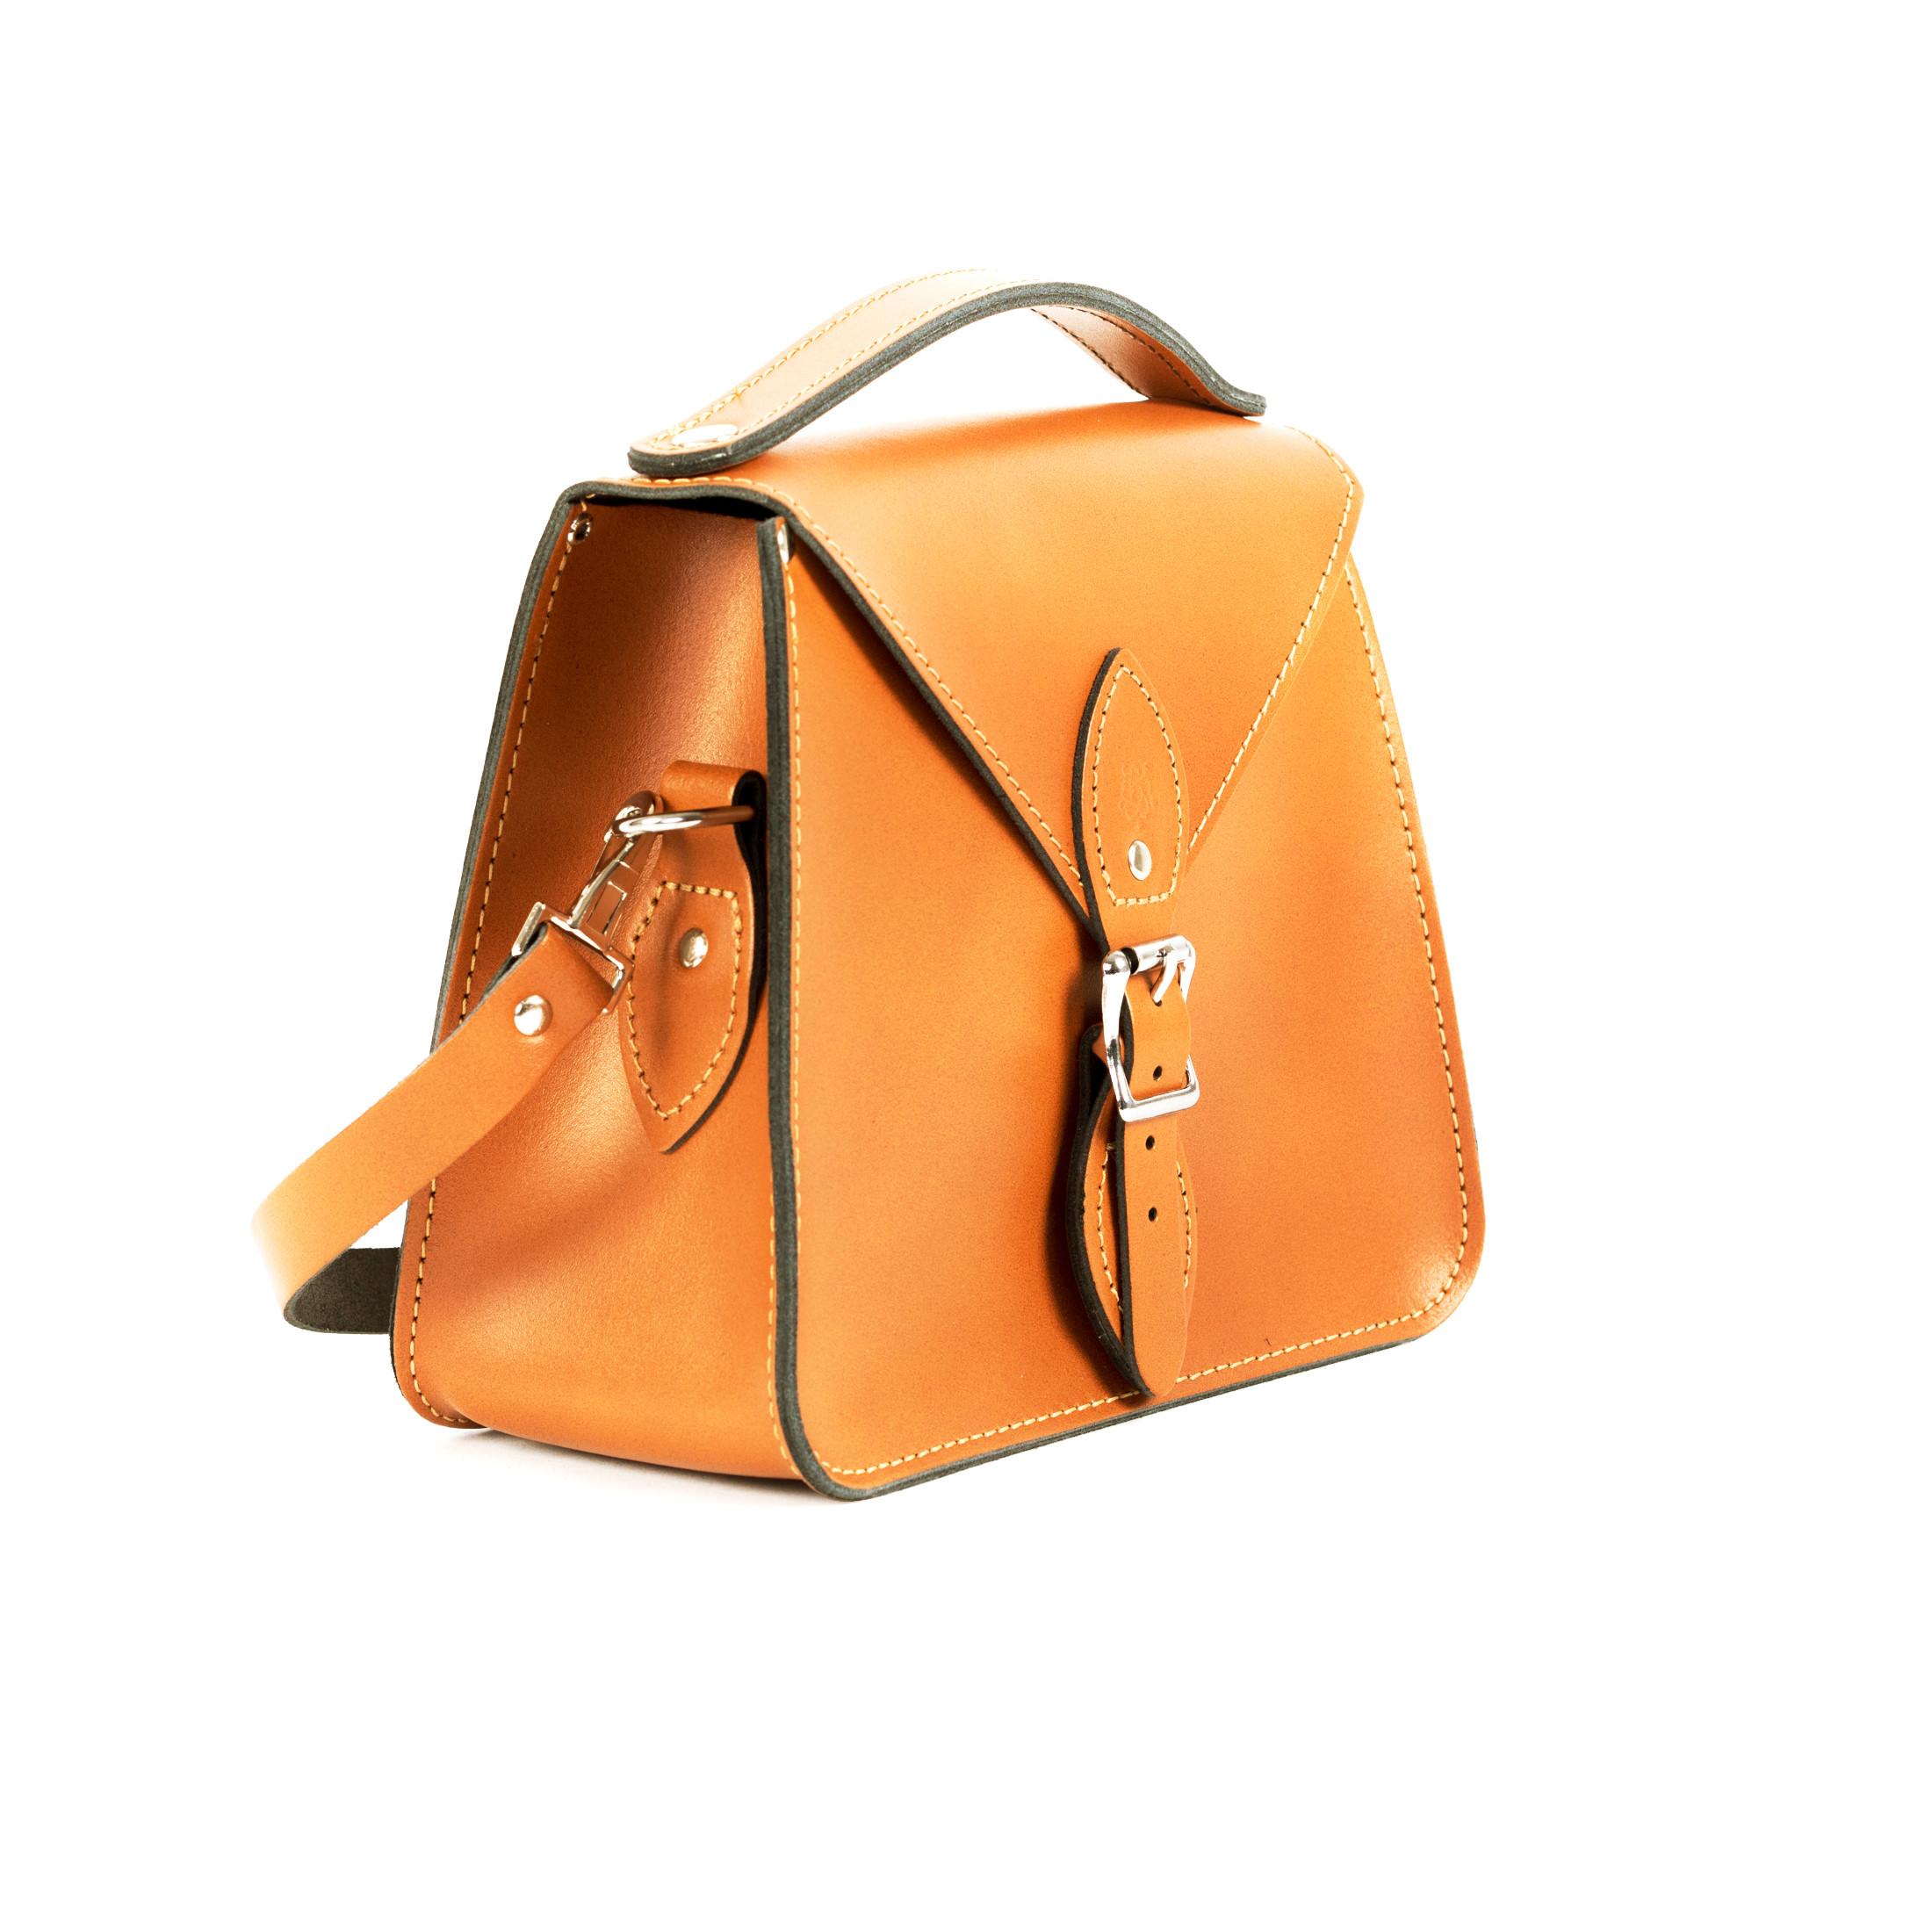 Esme Premium Leather Crossbody Bag in Light Tan